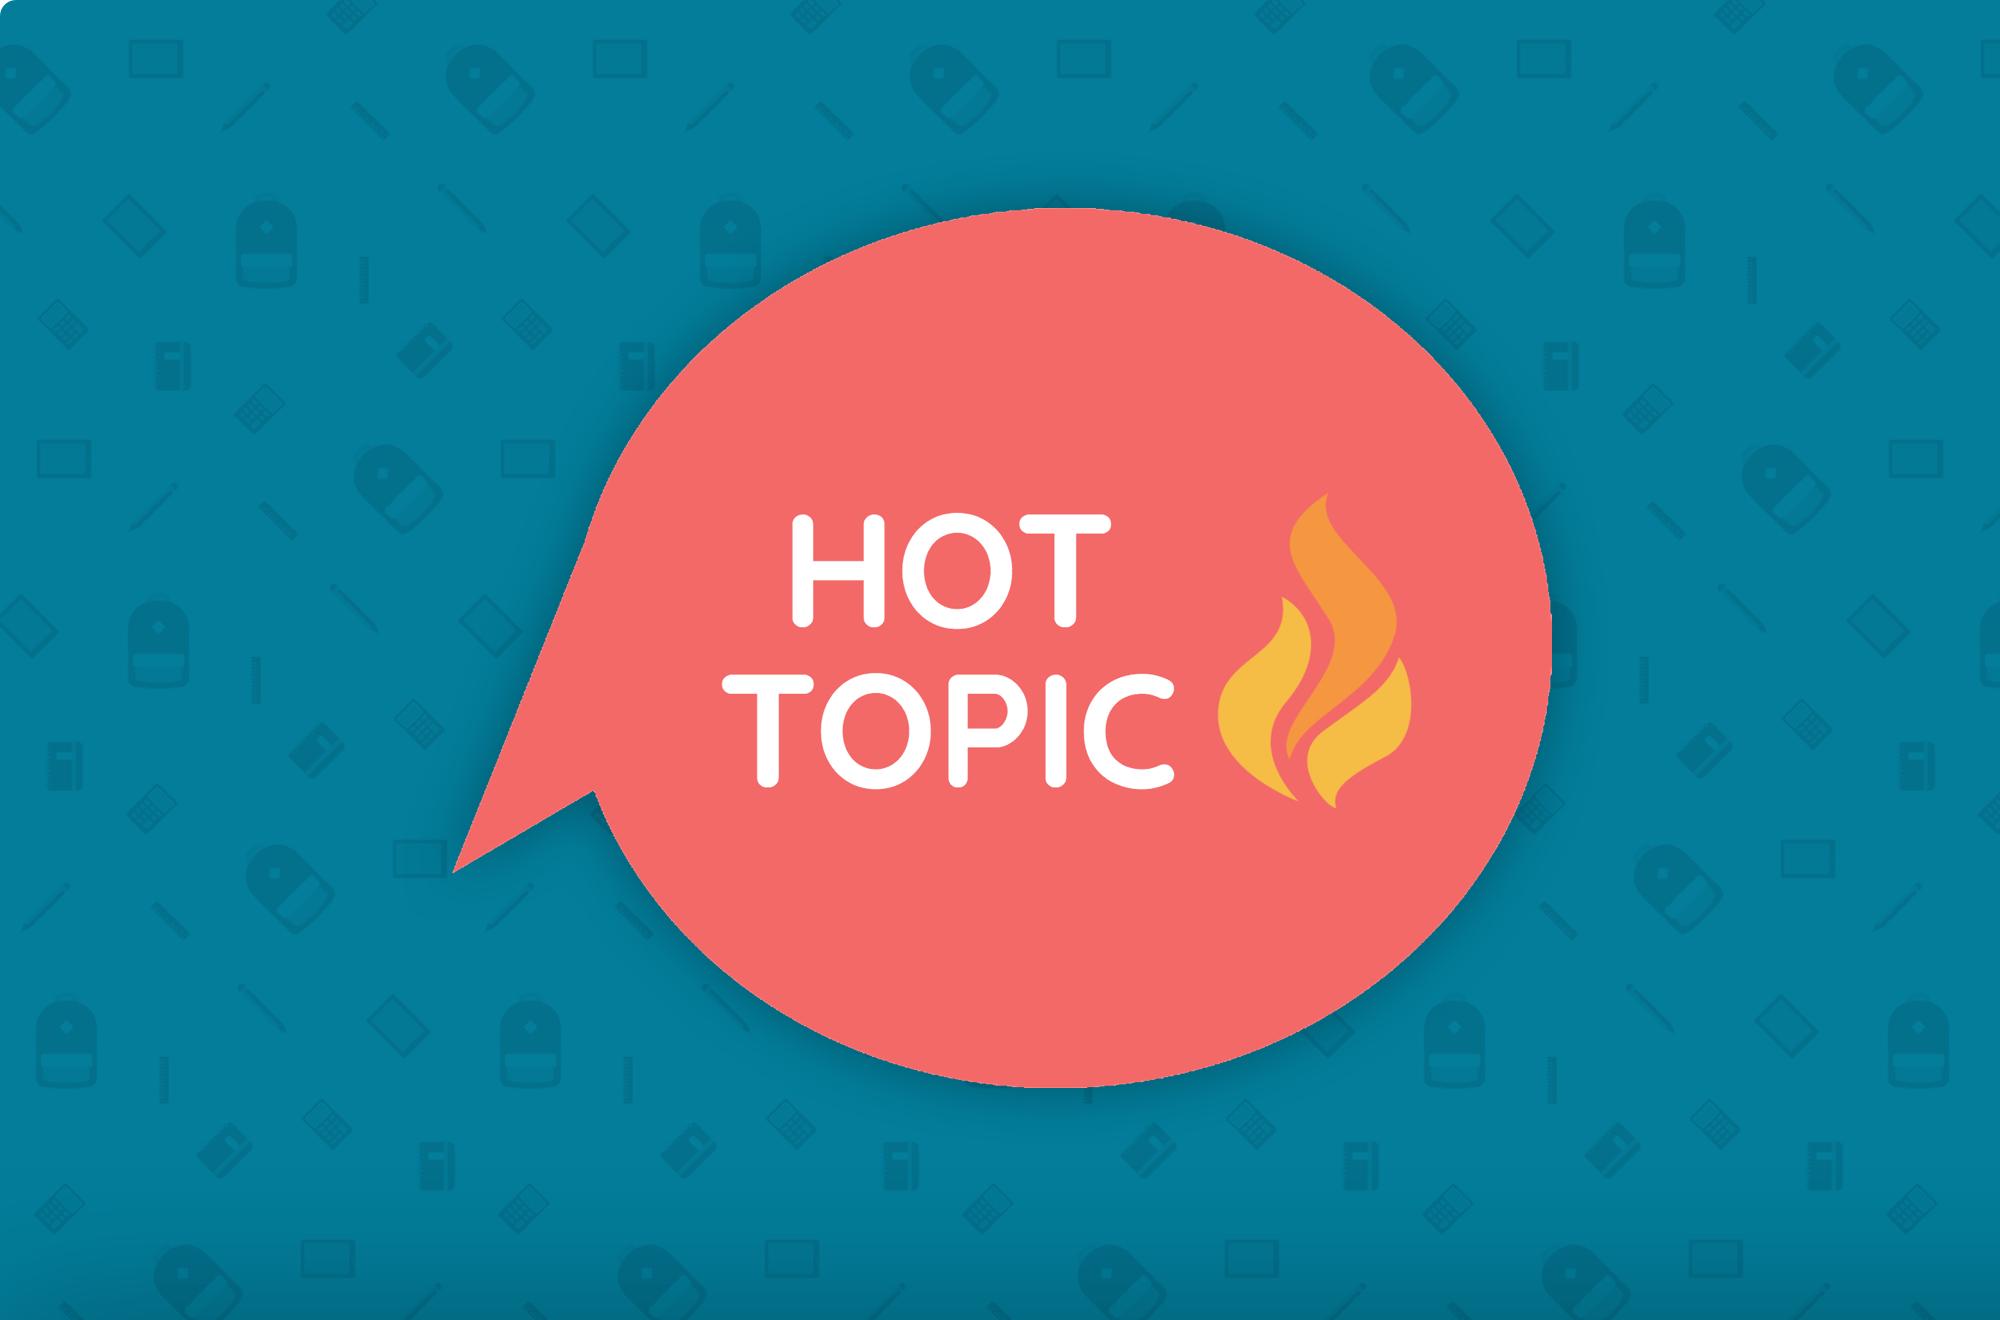 Hot Topic